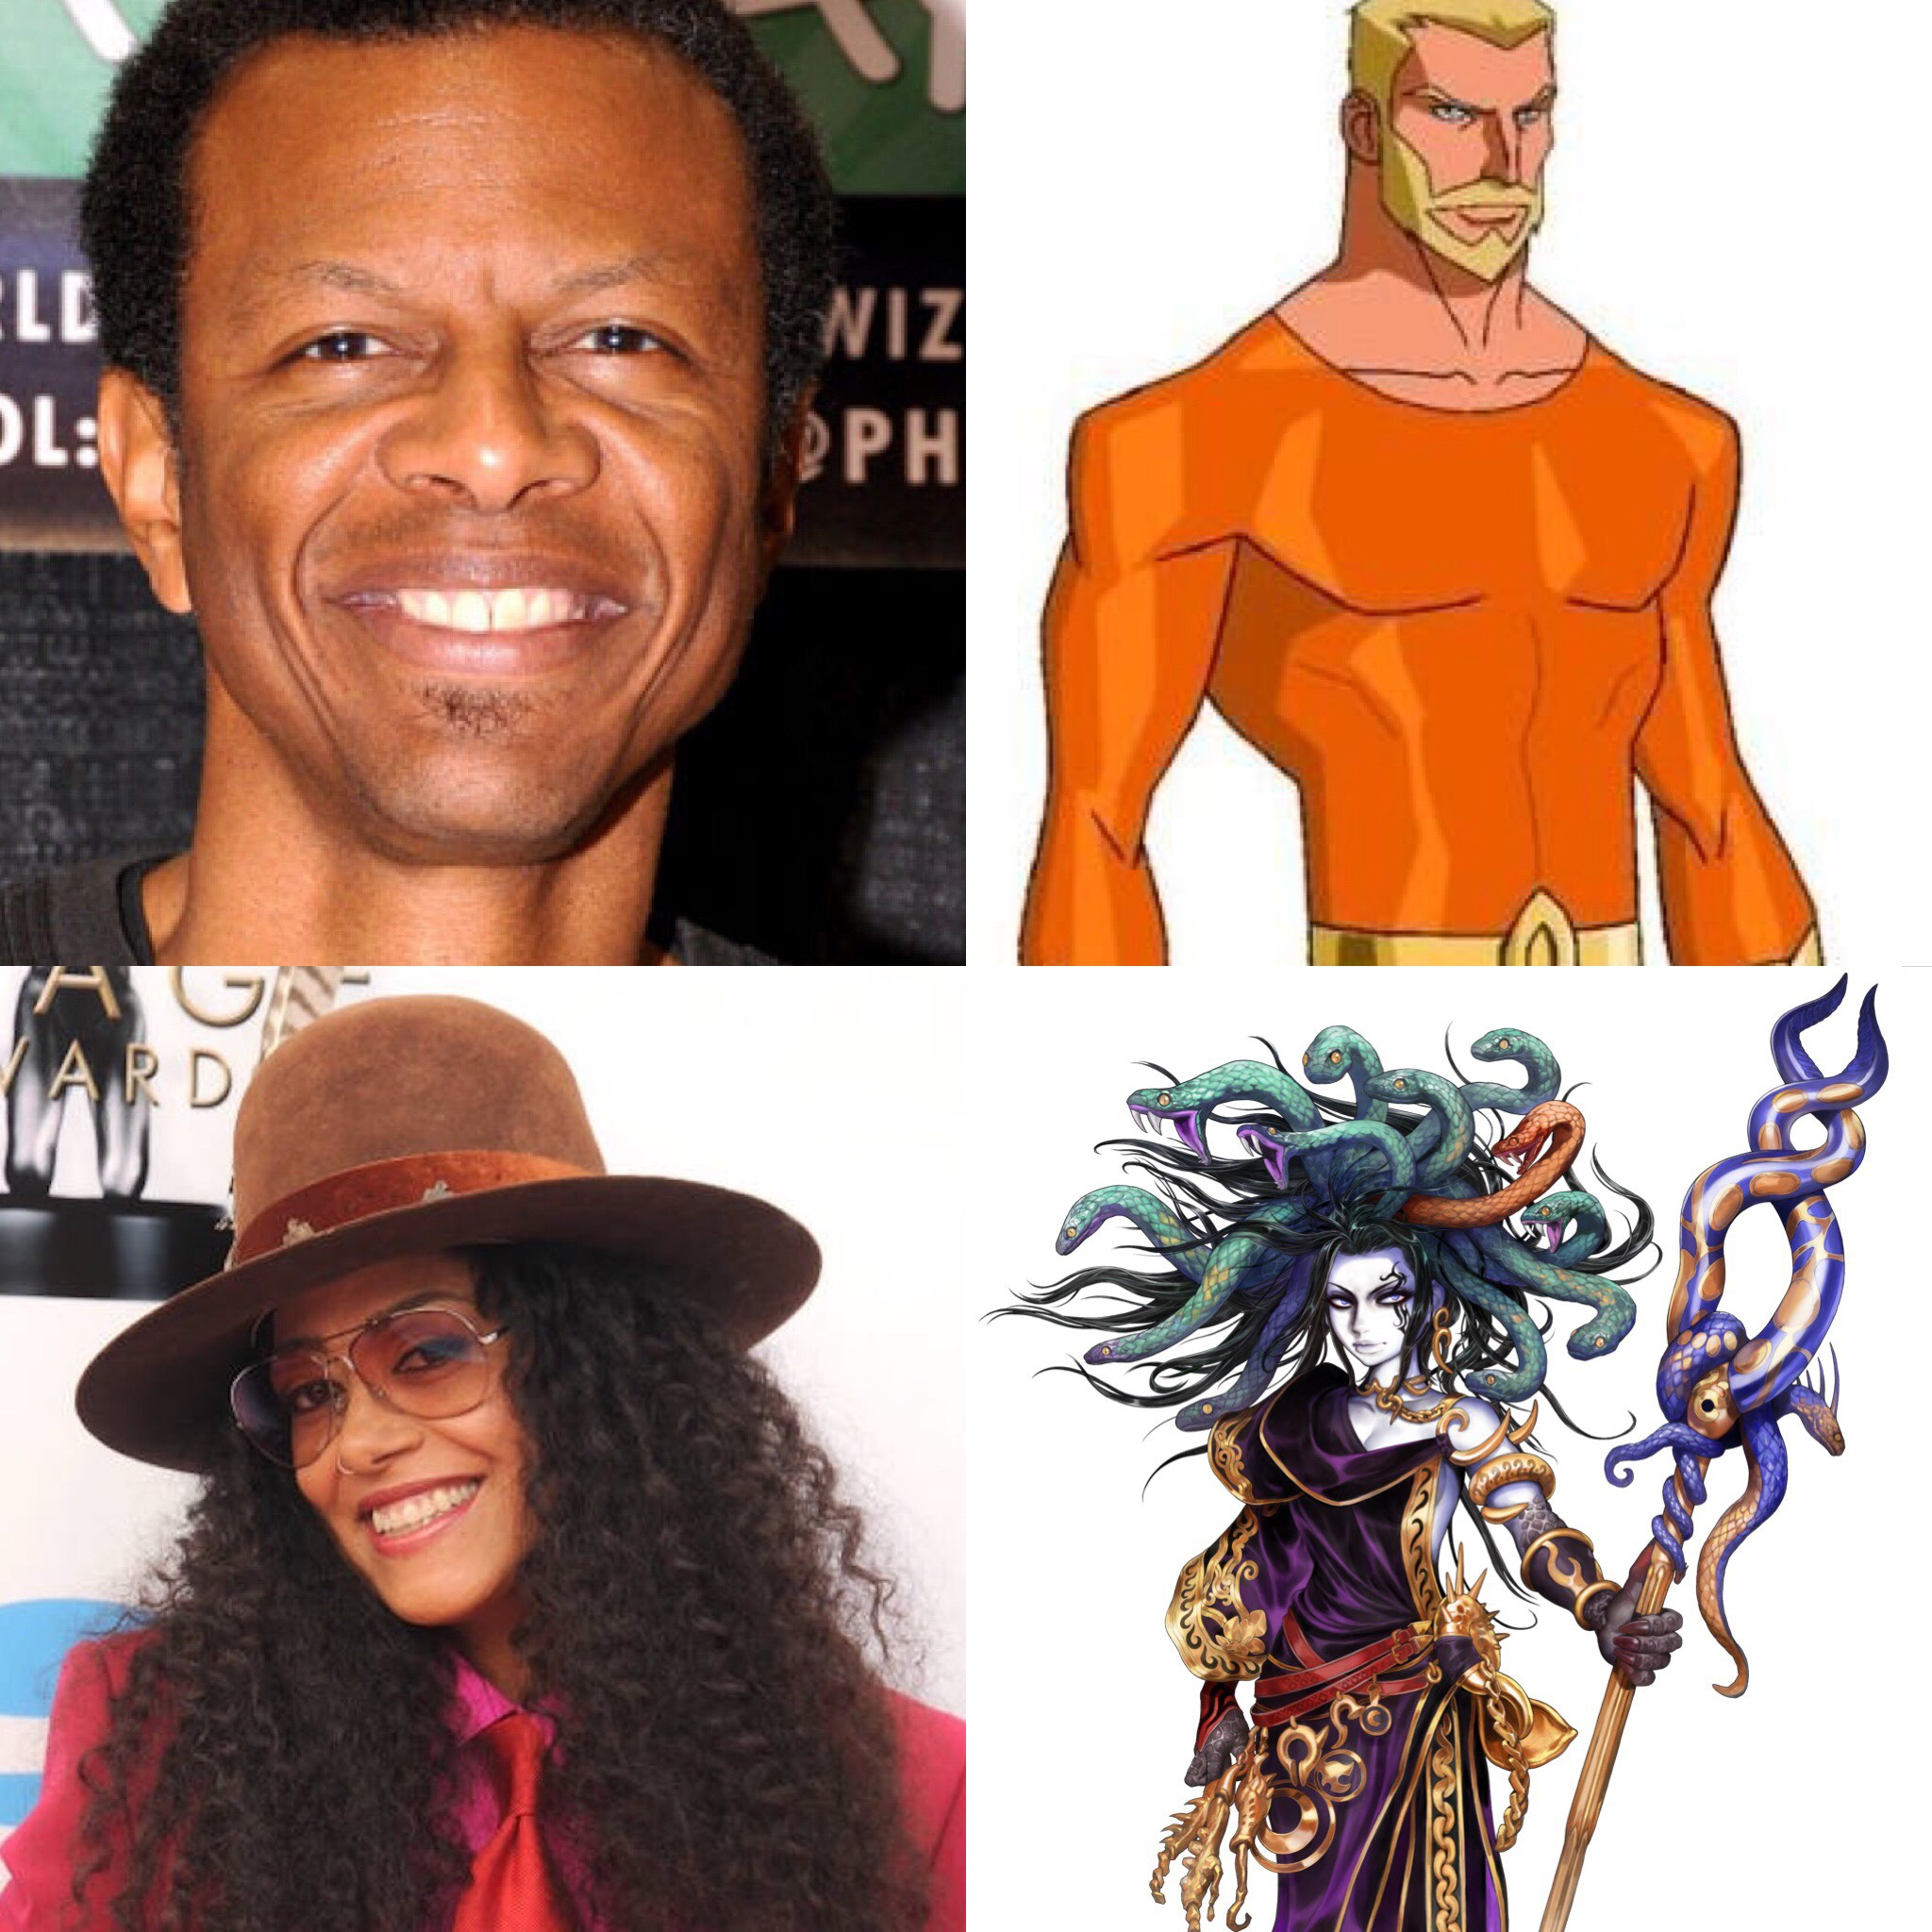 Phil LaMarr, Aquaman, Cree Summer, and Medusa